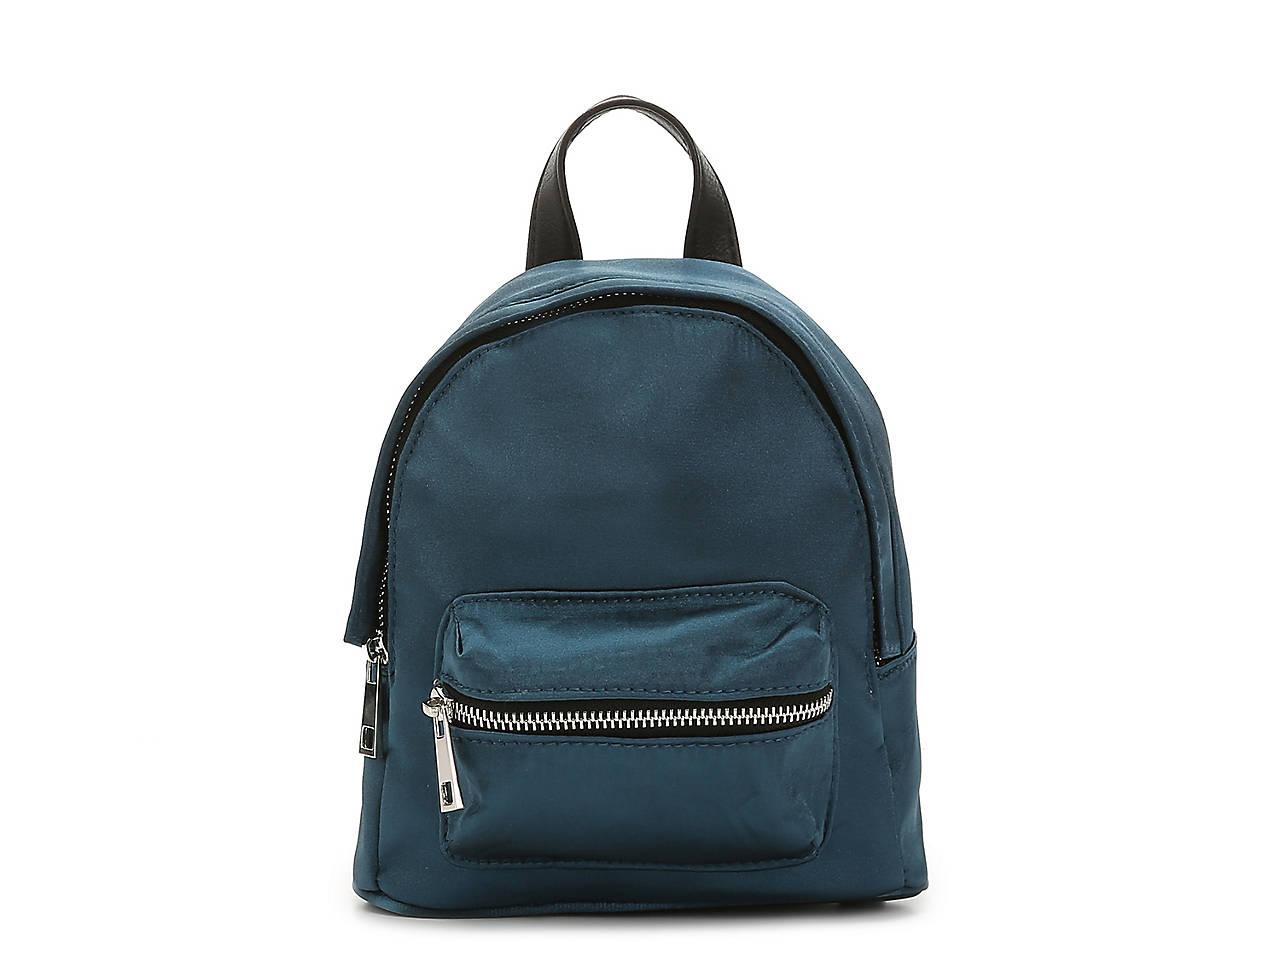 666302525d4 Madden Girl Port Mini Backpack Women's Handbags & Accessories | DSW